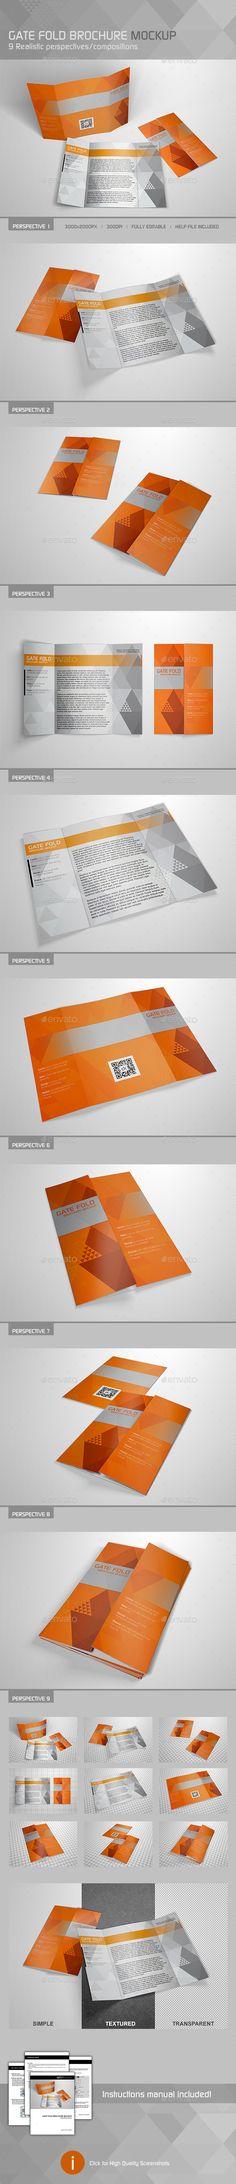 Square Gate Fold Brochure Mockup Mockup, Gates and Brochures - gate fold brochure mockup